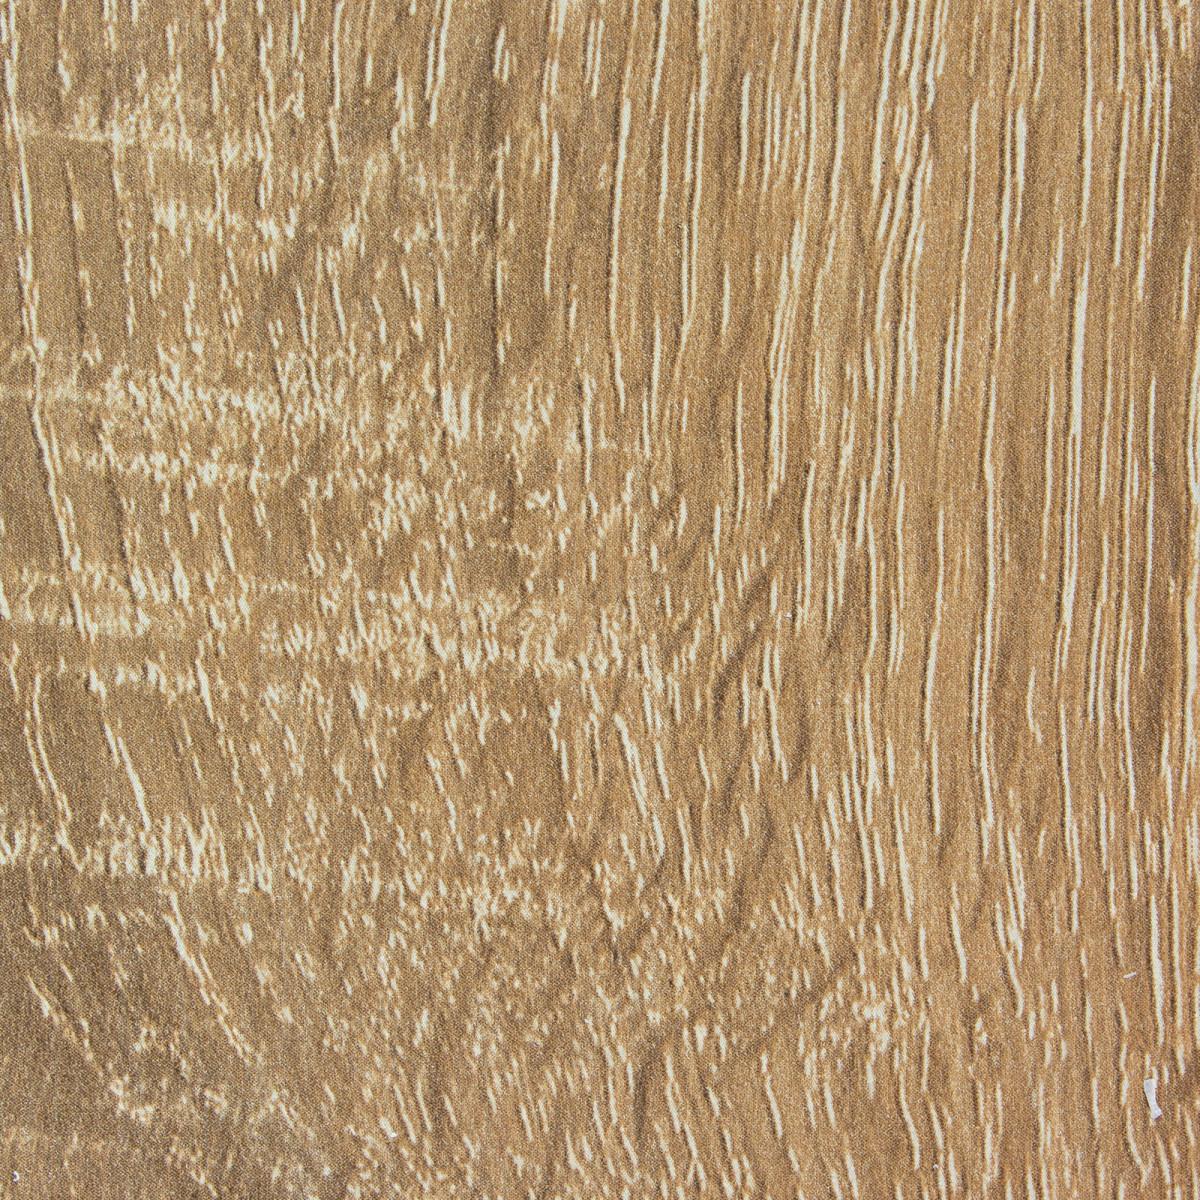 Деталь мебельная 1200х400х16 мм ЛДСП цвет дуб сонома кромка со всех сторон